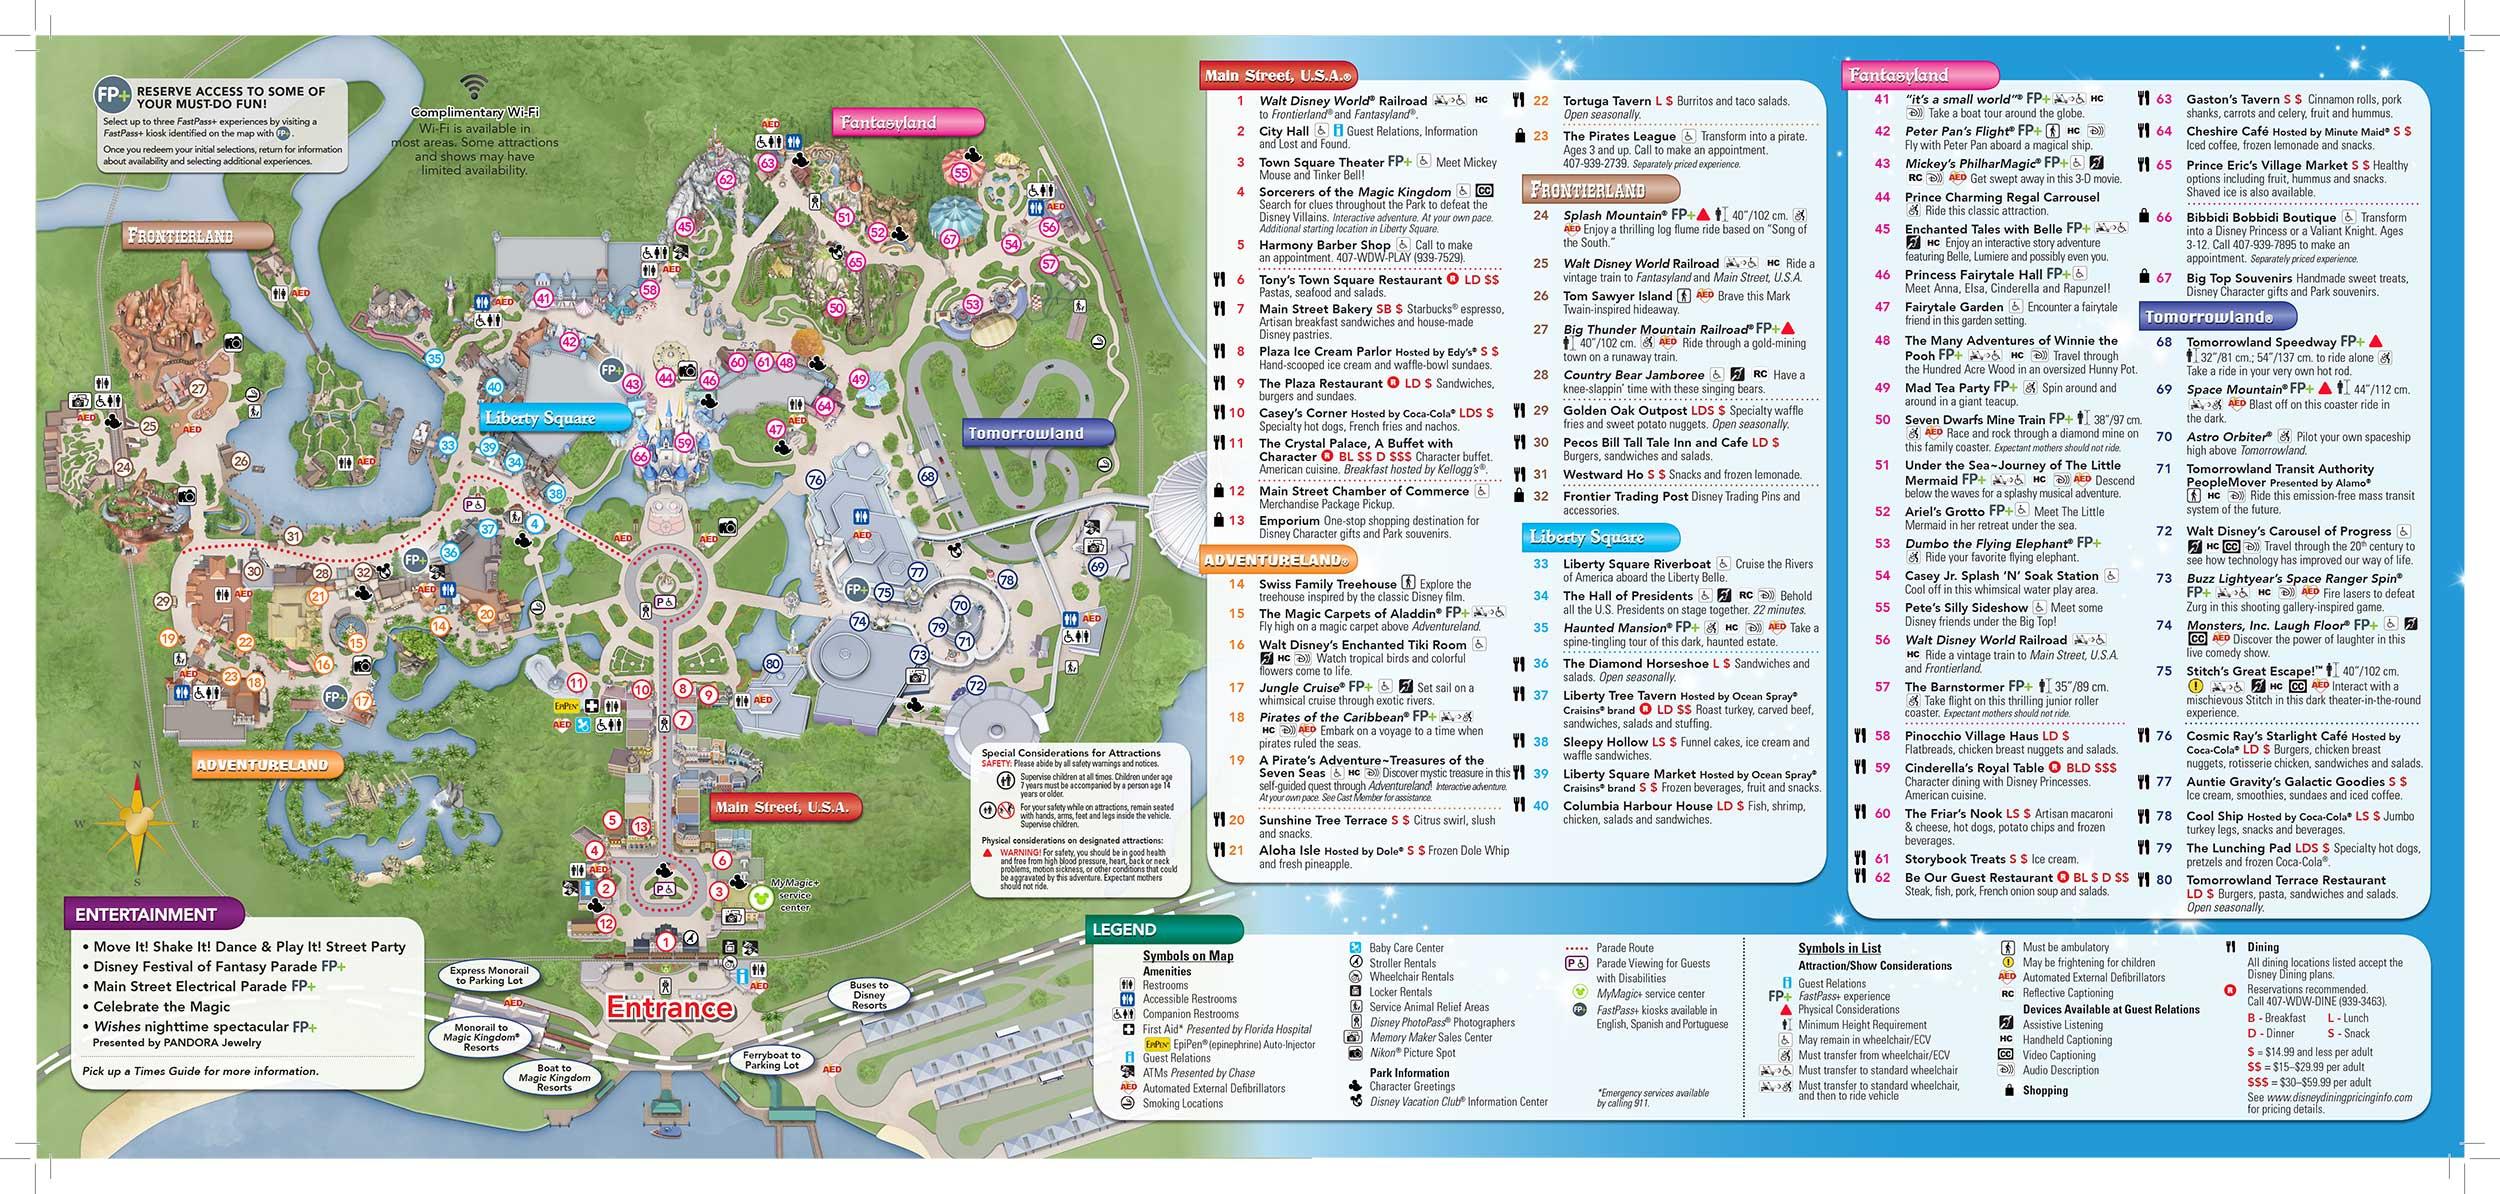 Amazing Printable Disney World Maps 7 - Link-Italia - Printable Disney World Maps